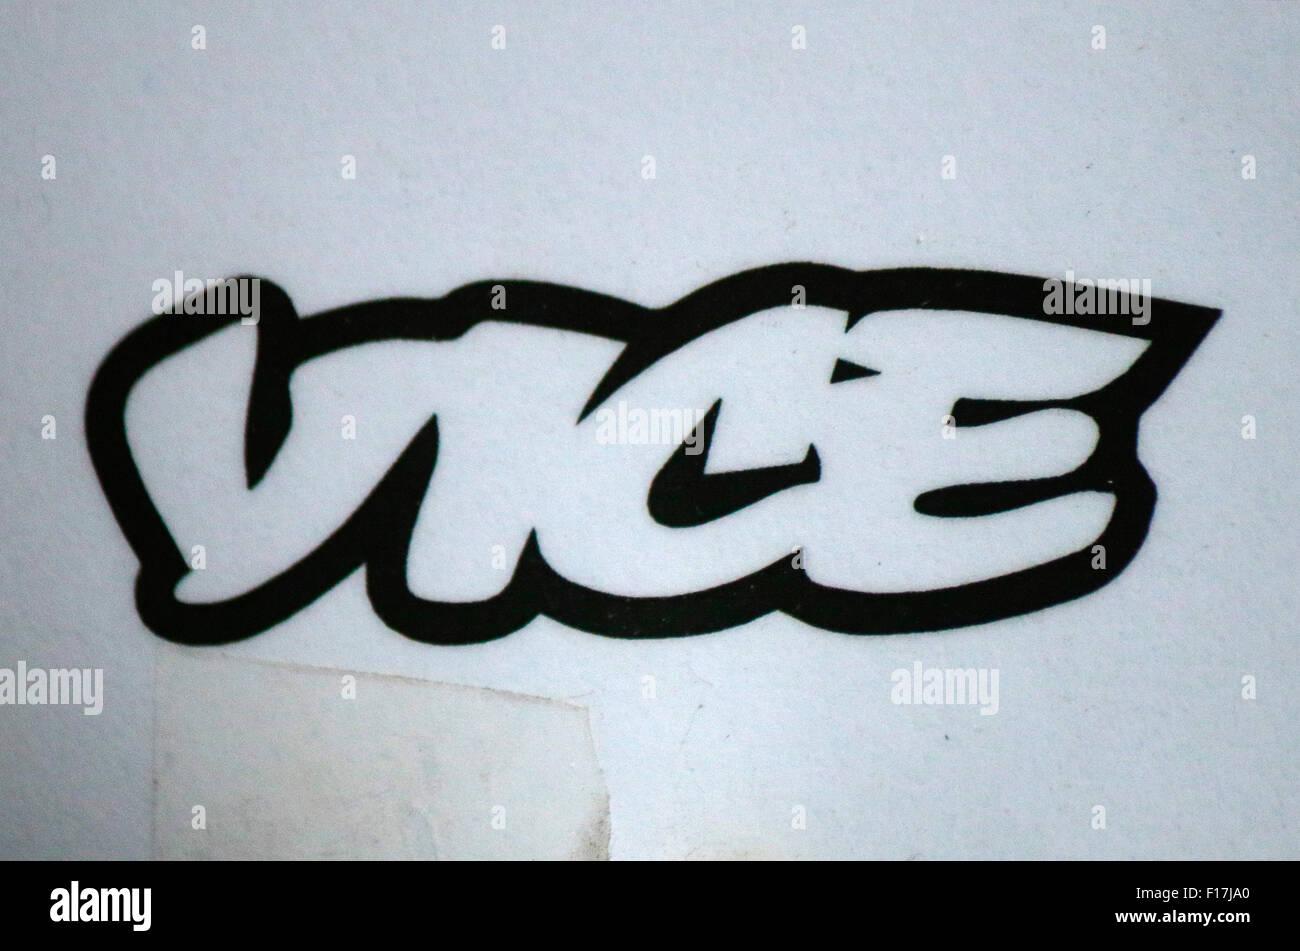 Markennamen: 'Vice', Berlin. - Stock Image